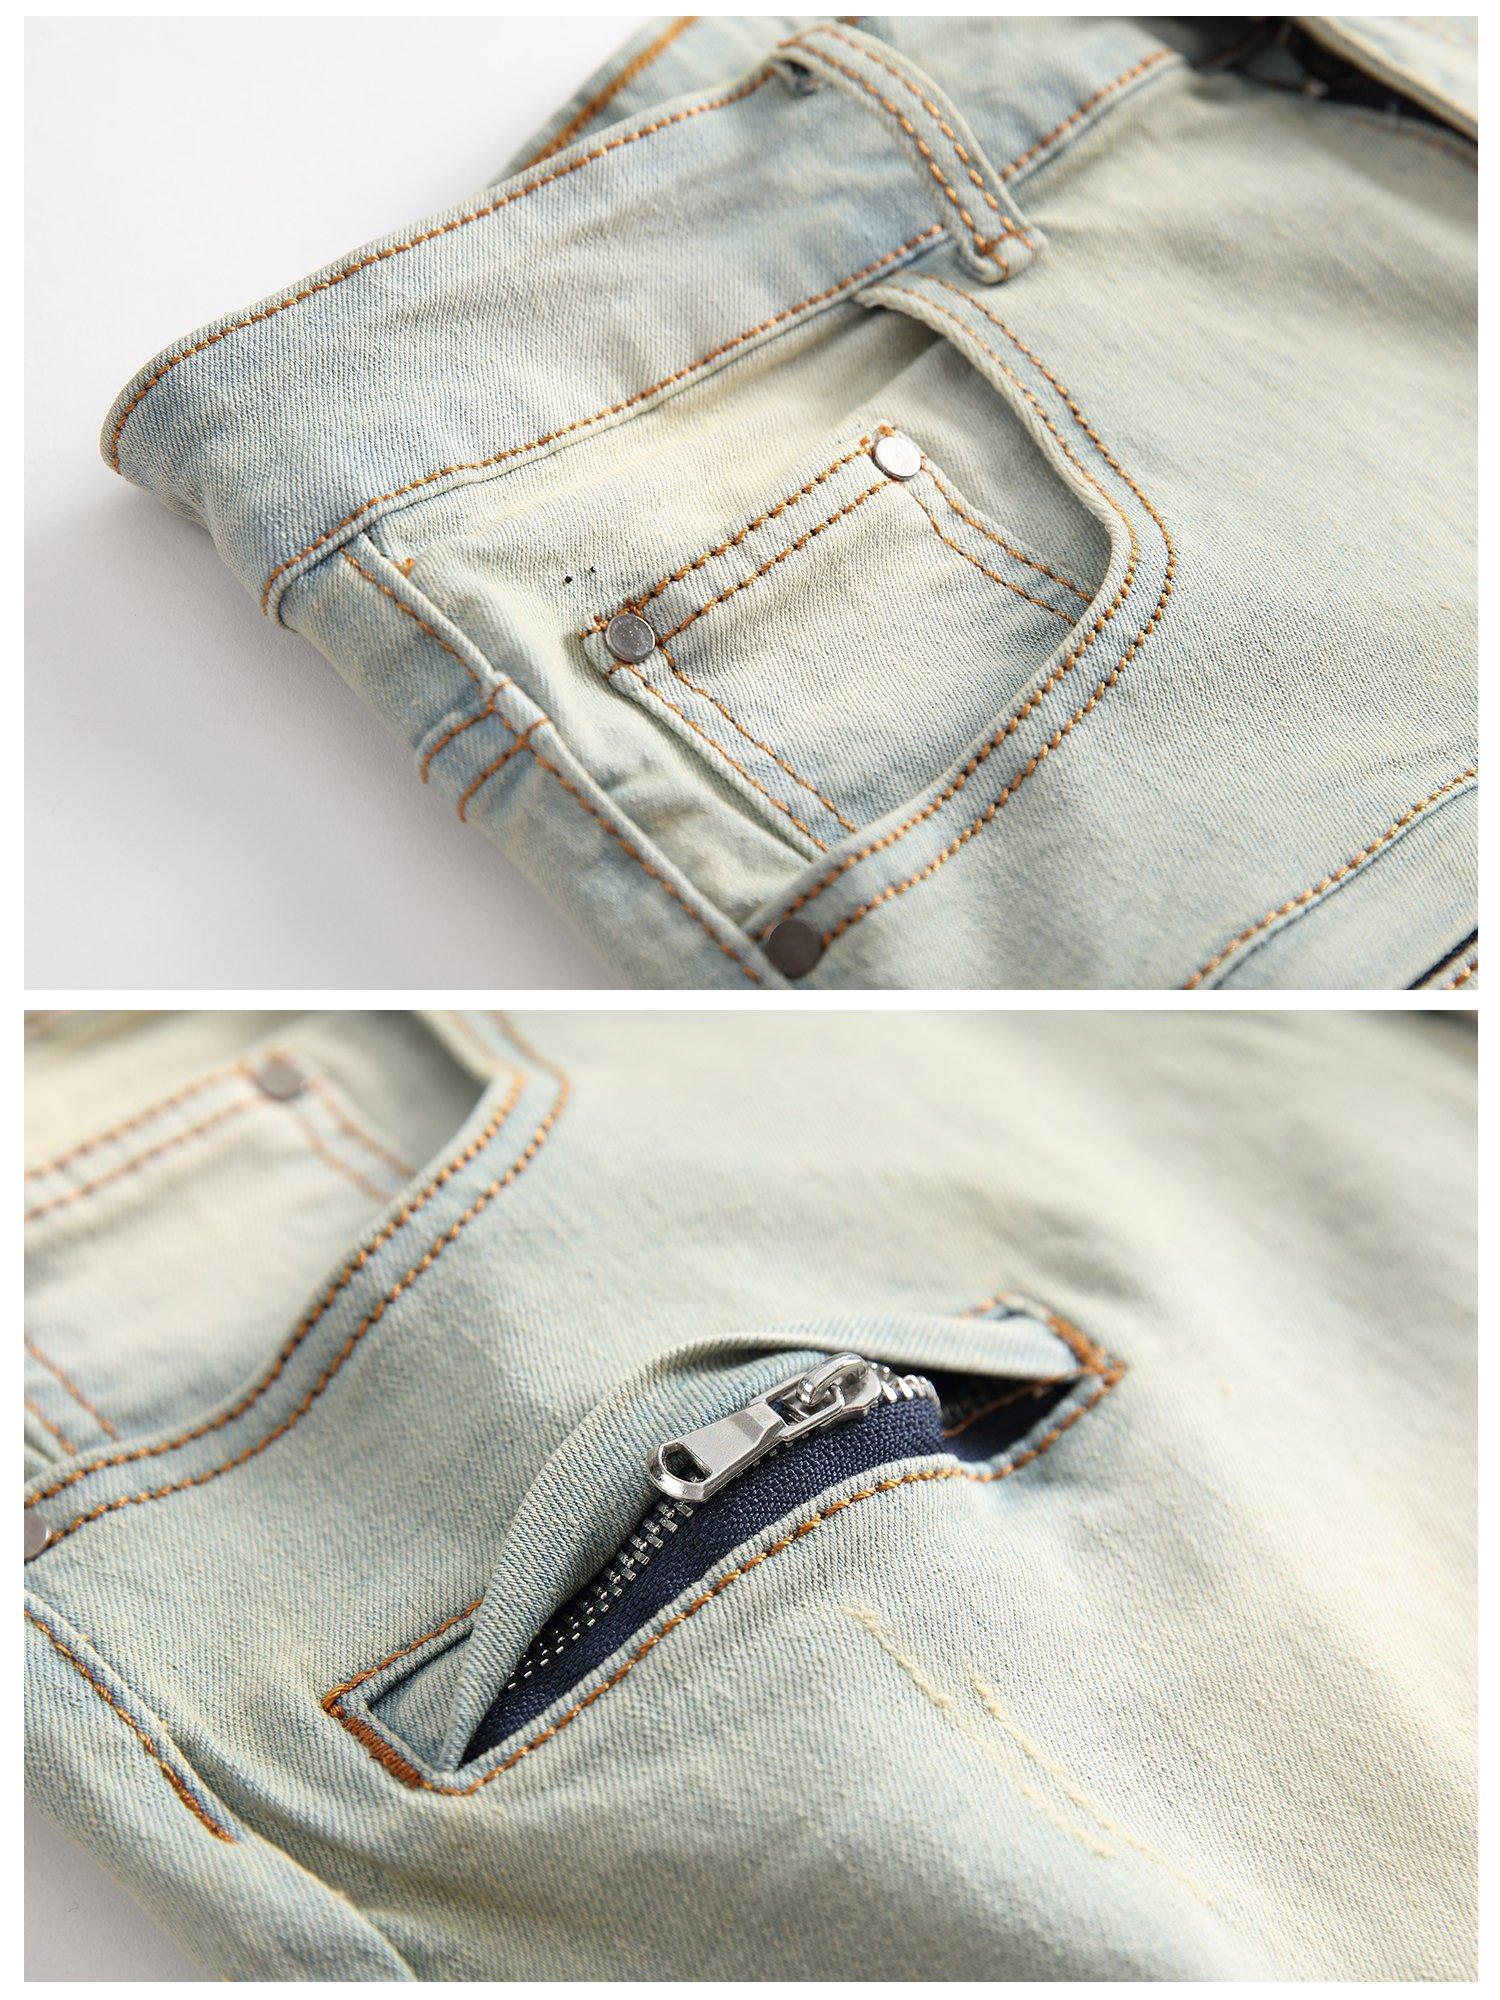 CLANNAD Men's Moto Biker Shorts Jeans Zipper Denim Casual Slim Shorts with Hole Vintage Blue 30 by CLANNAD (Image #3)